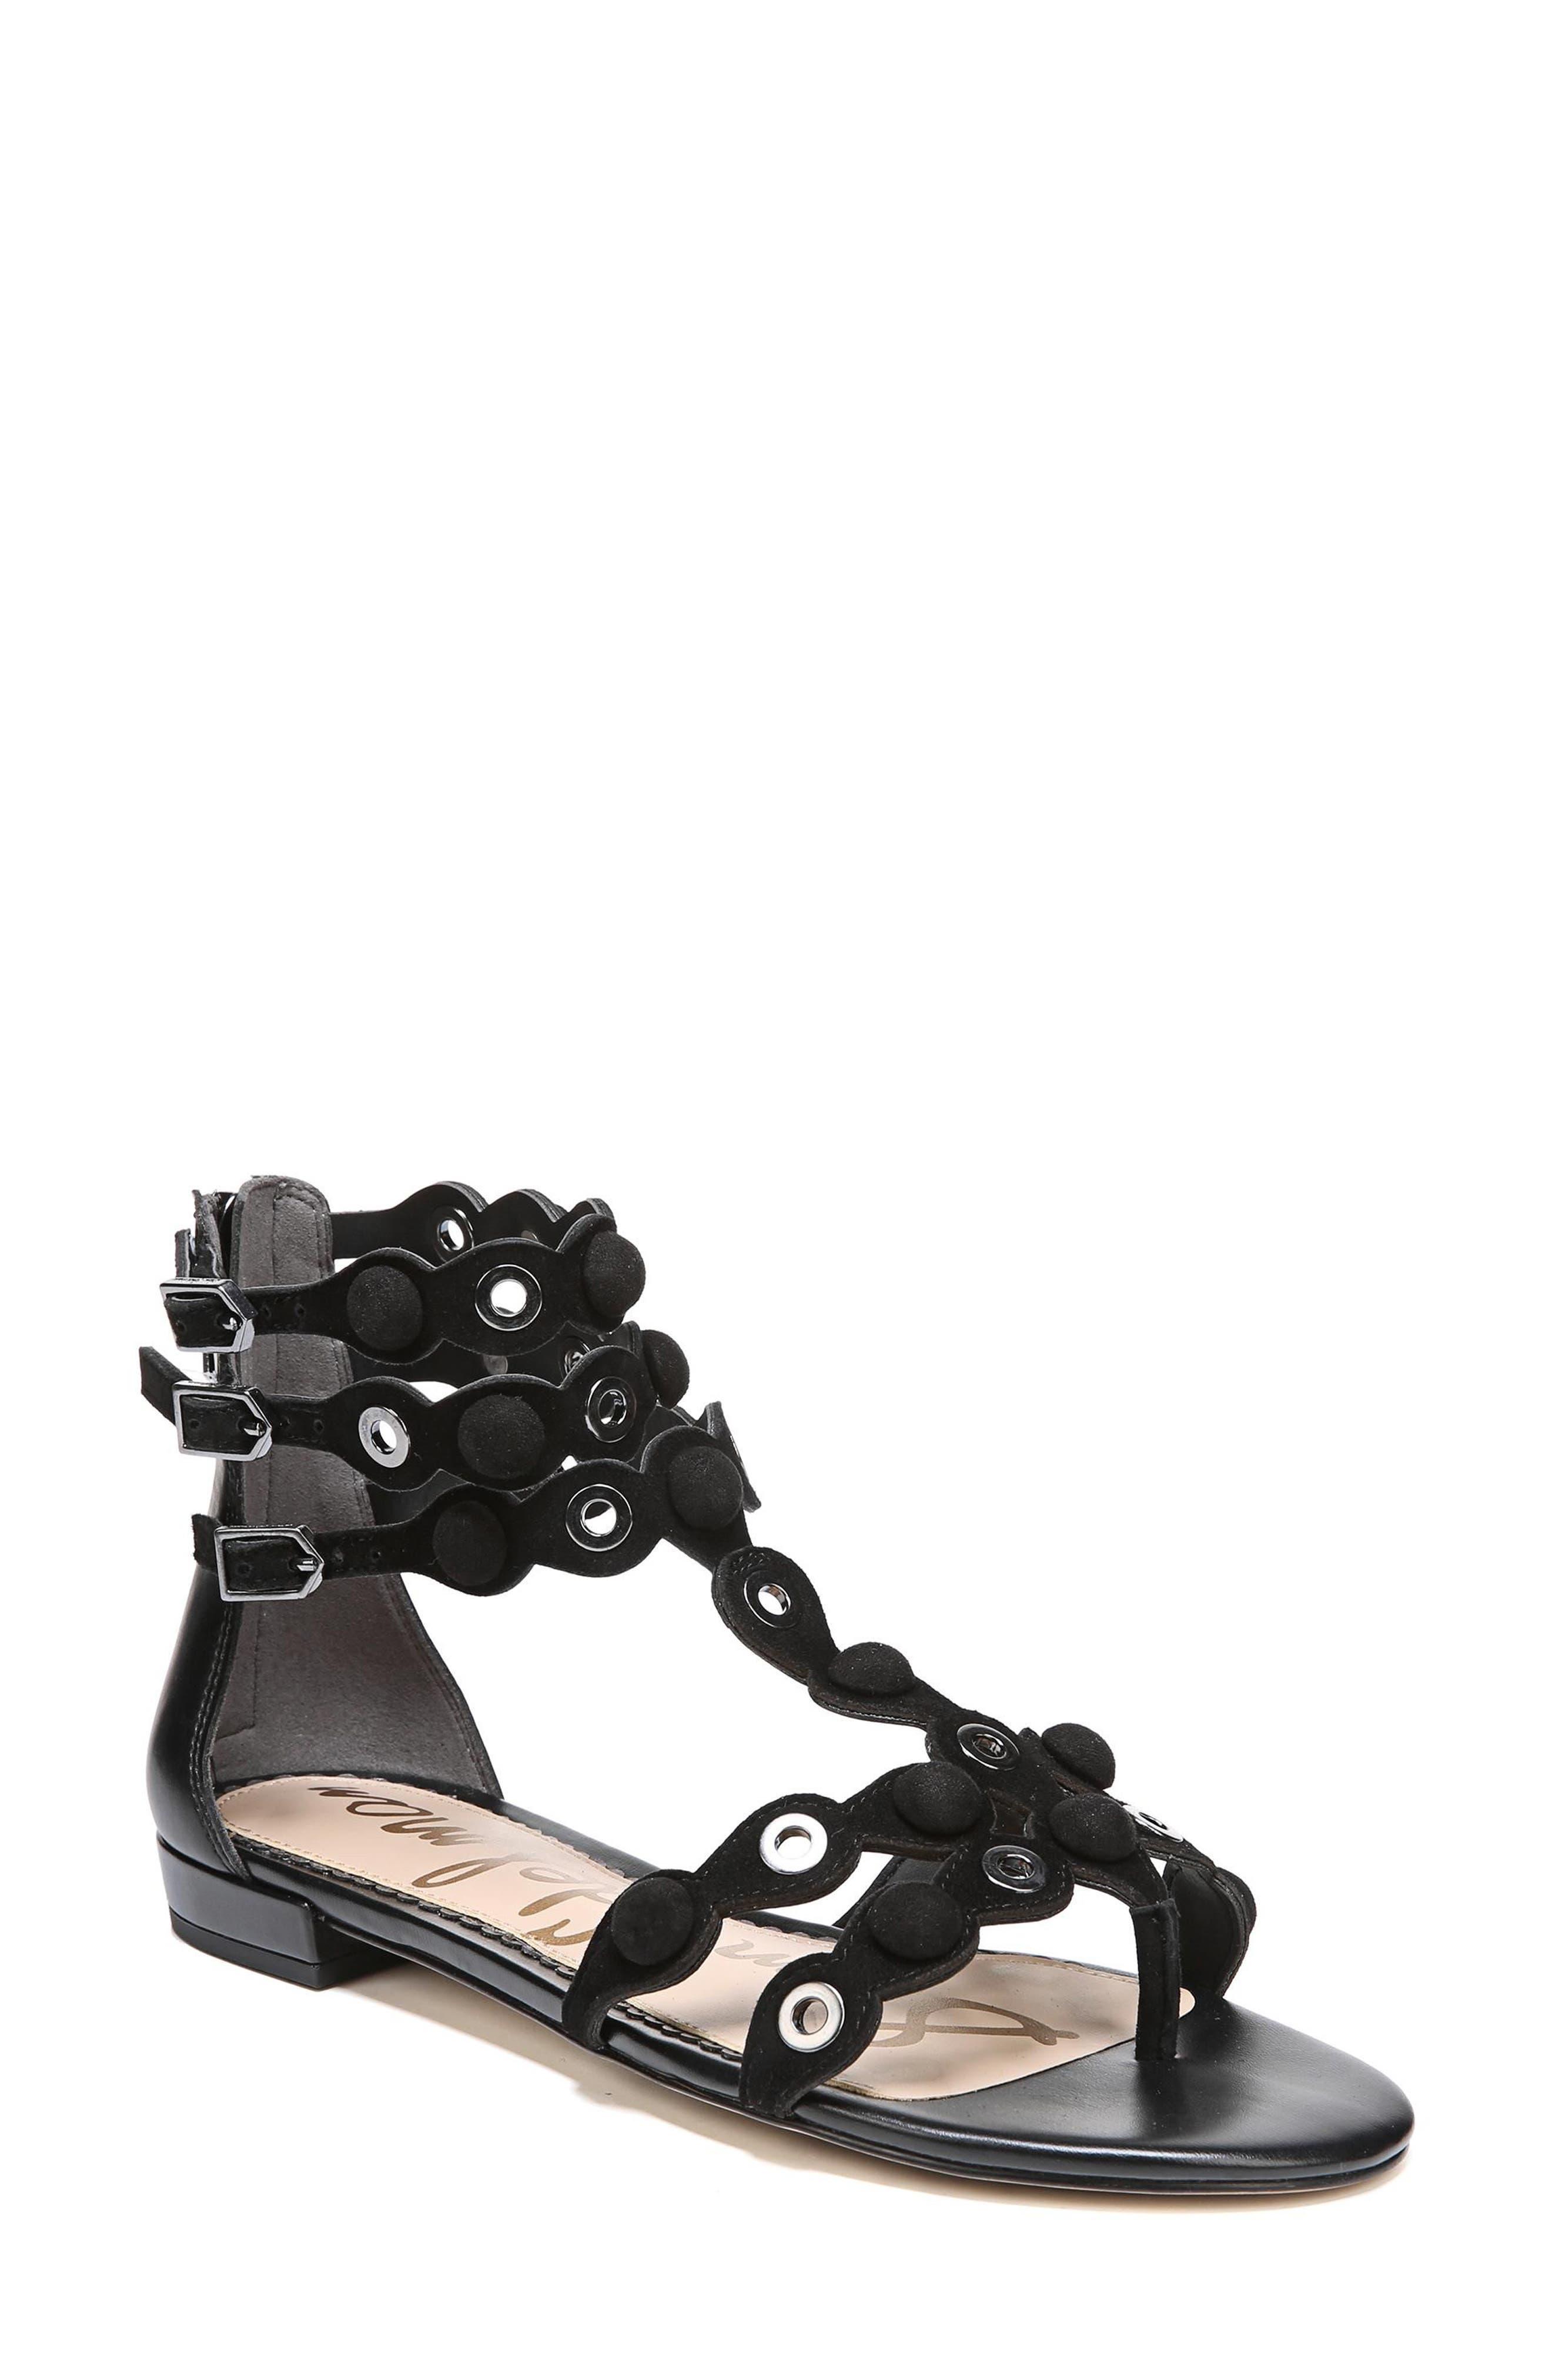 Sam Edelman Desi Suede Sandals Perfect Cheap Price rLcVhH